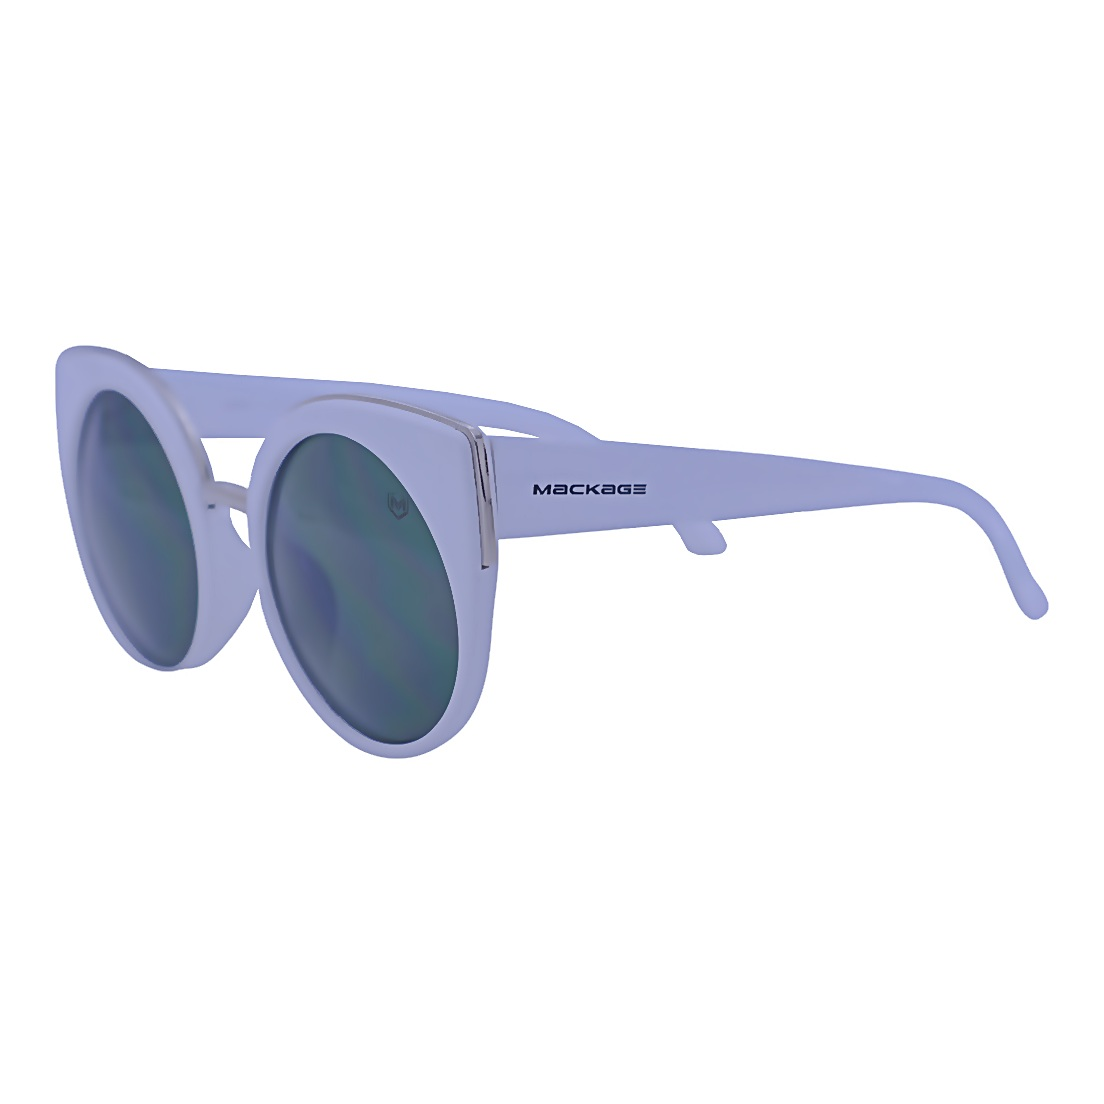 Óculos De Sol Mackage Feminino Acetato Gateado Retro - Branco